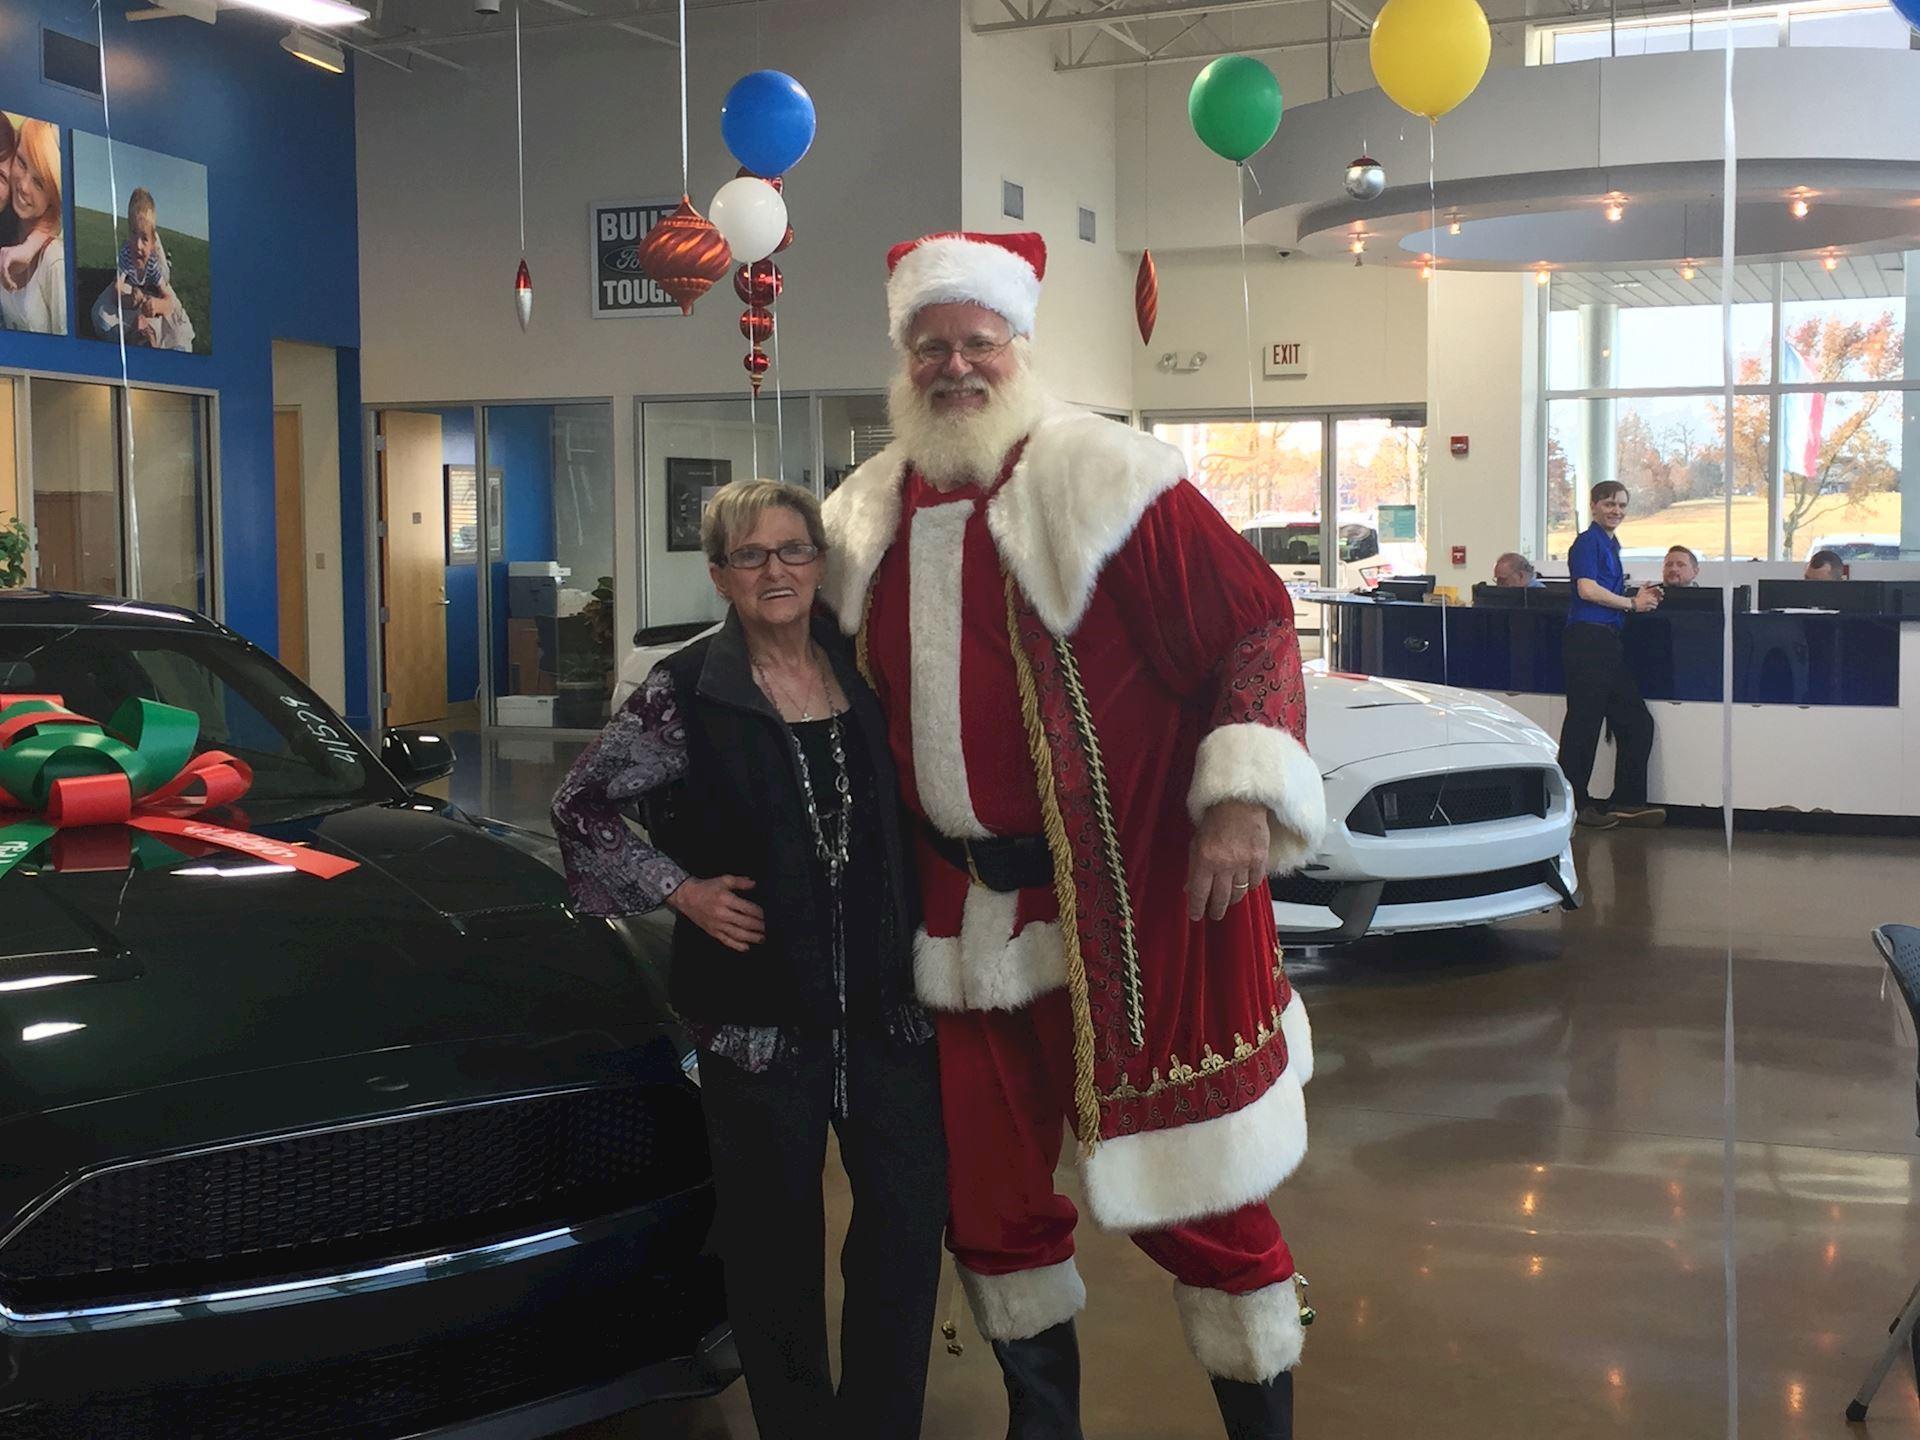 The tallest Santa